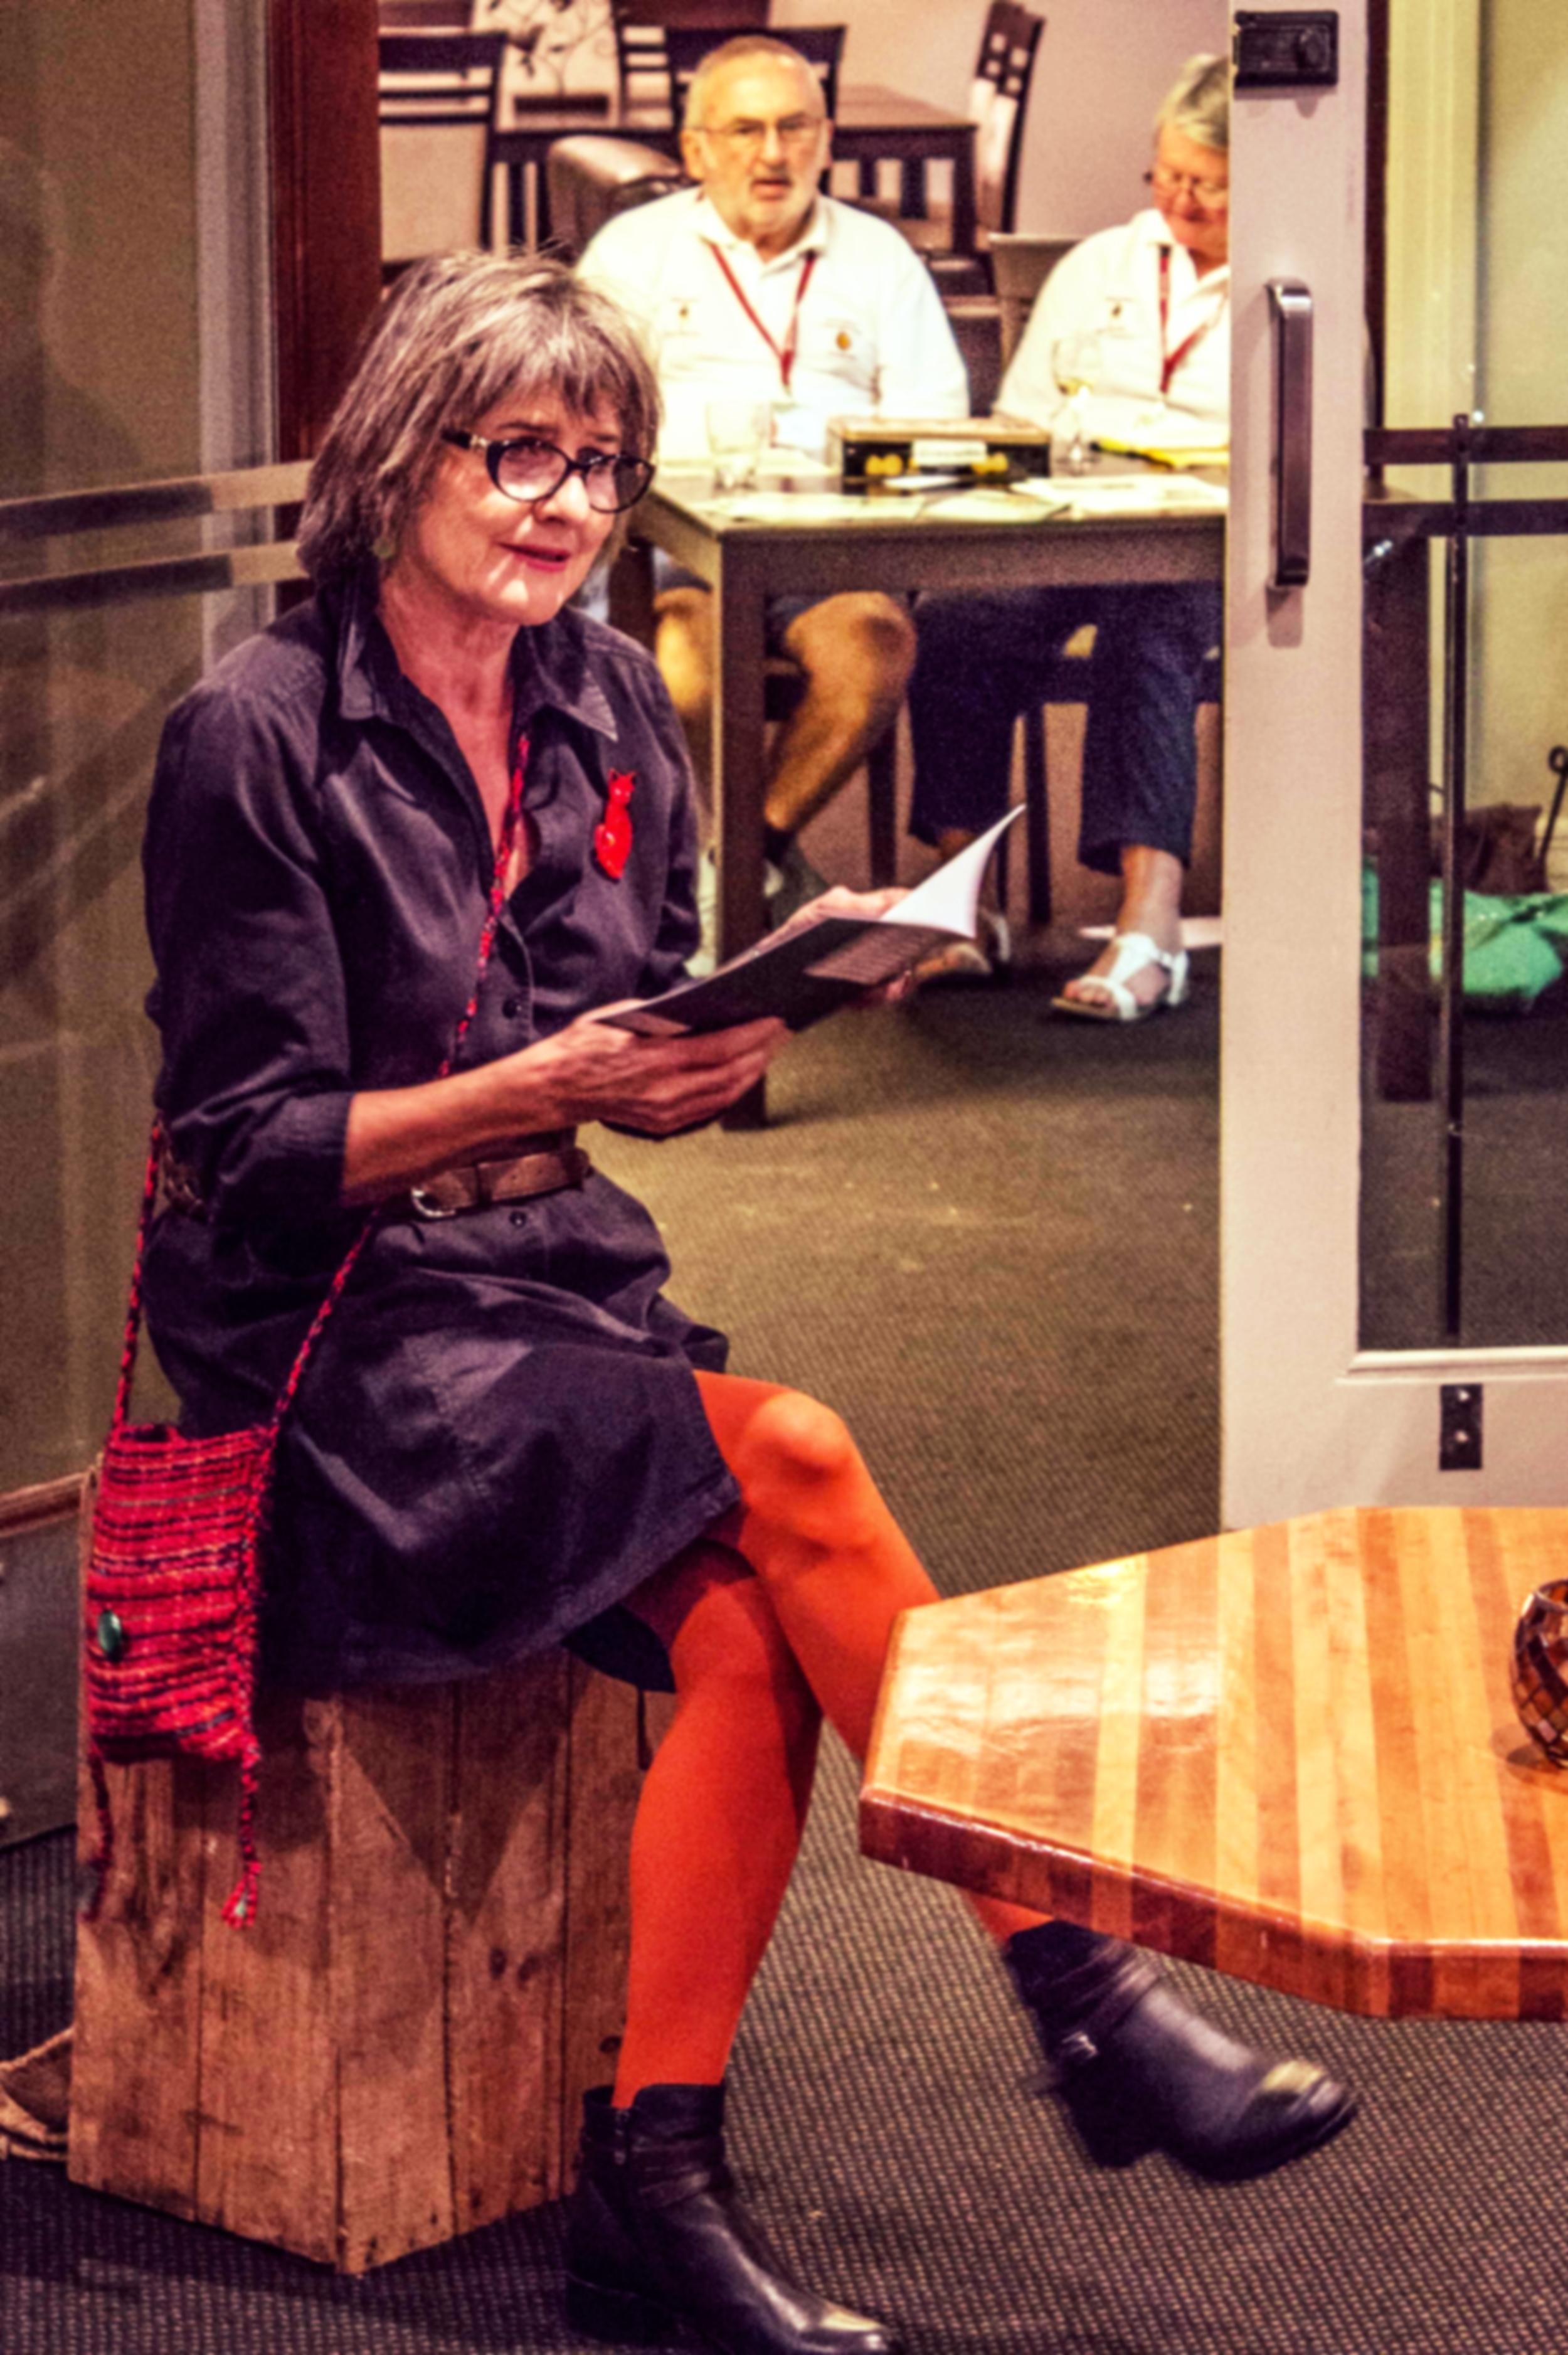 Melanie-Baulch-at-JOB-booklet-launch.jpg